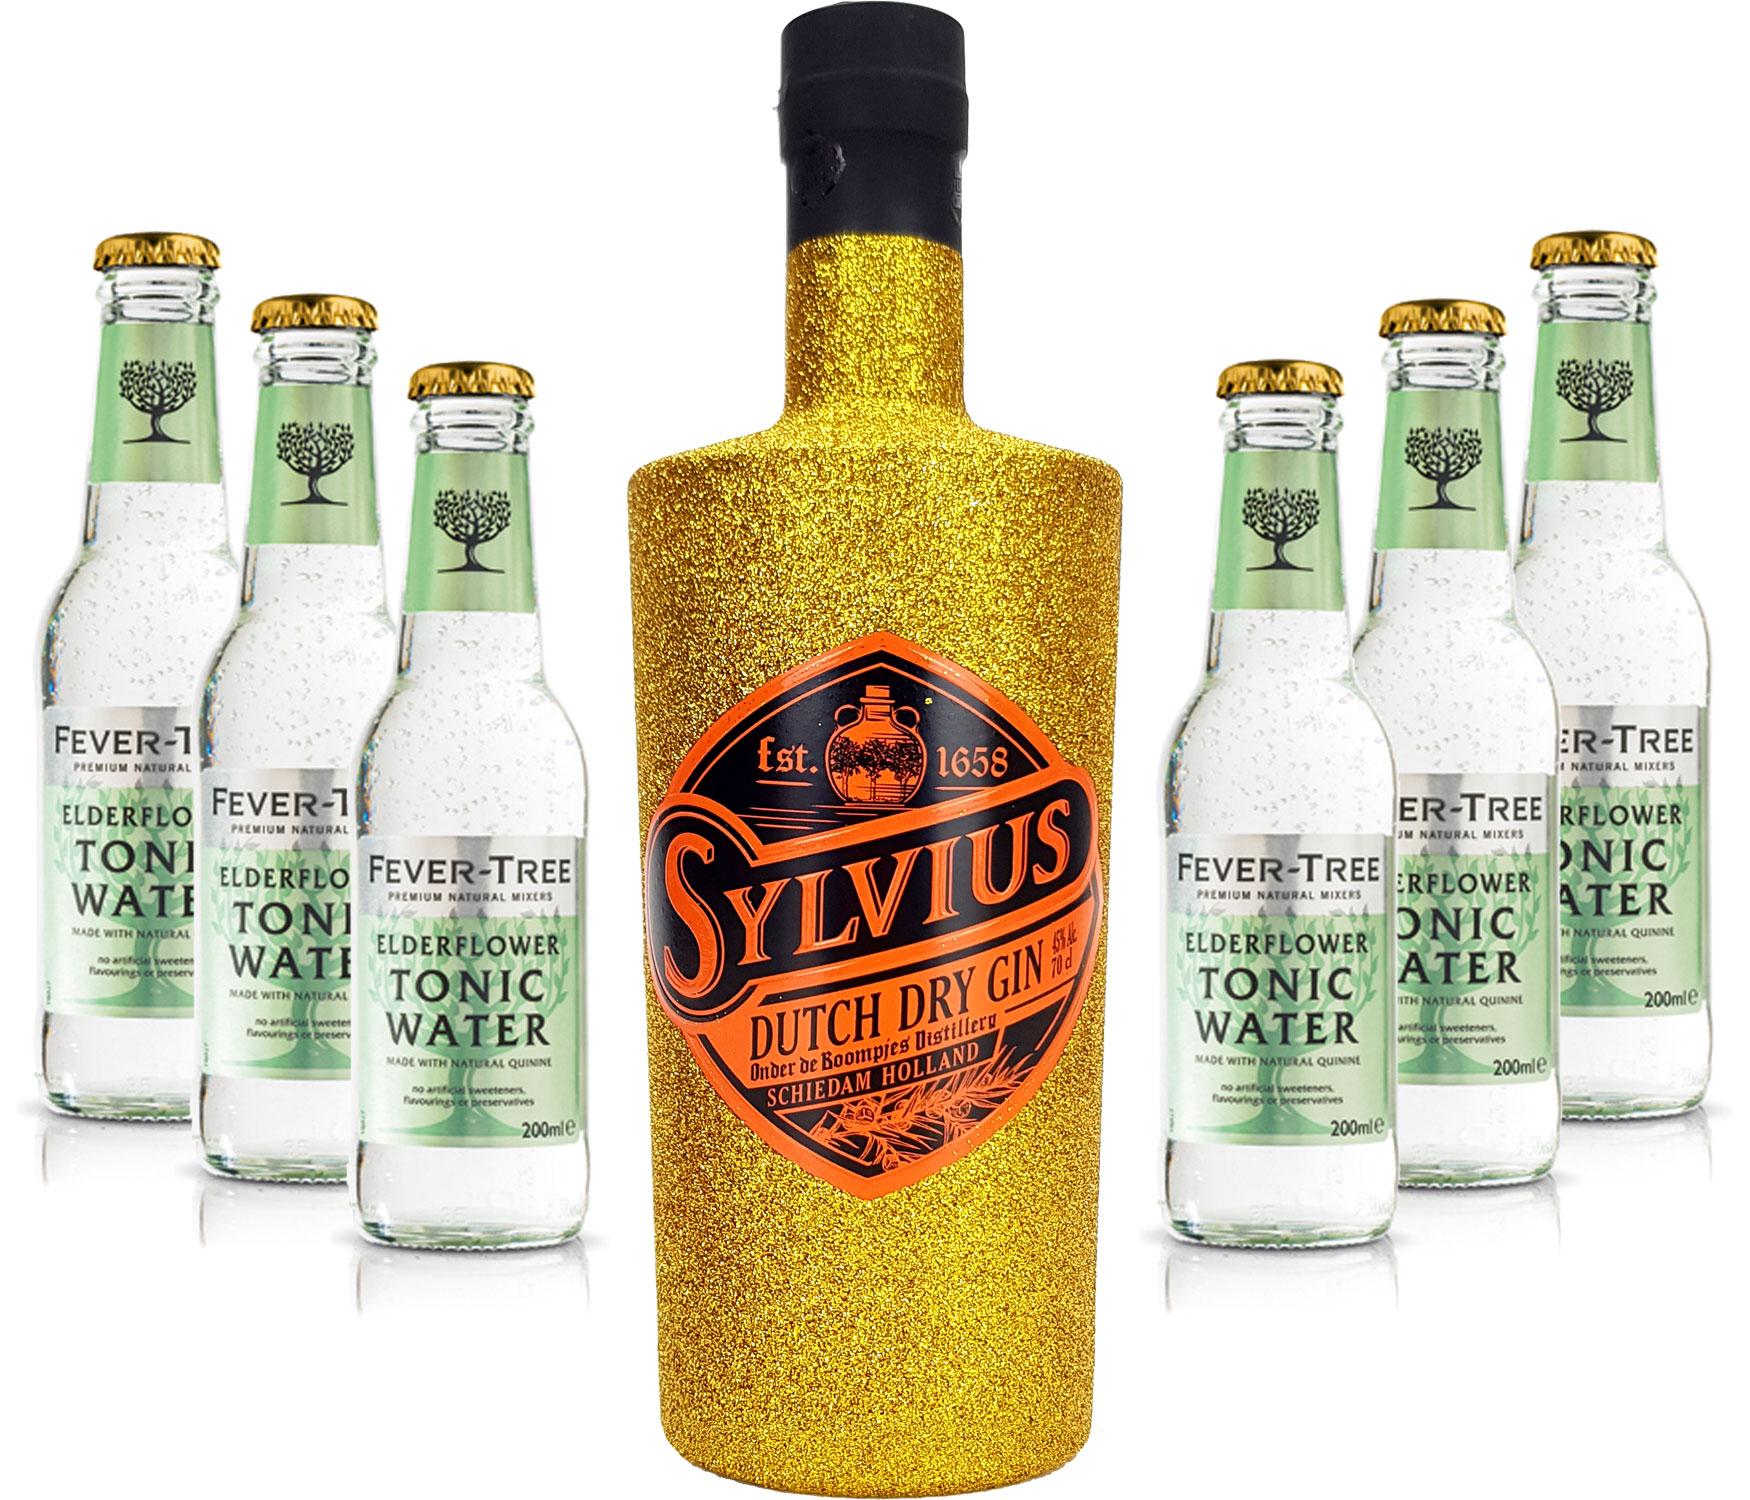 Gin Tonic Bling Bling Gold Glitzer Set Geschenkset - Sylvius Dutch Gin 0,7l 700ml (45% Vol) + 6x Fever Tree Elderflower Tonic Water 200ml inkl. Pfand MEHRWEG -[Enthält Sulfite]